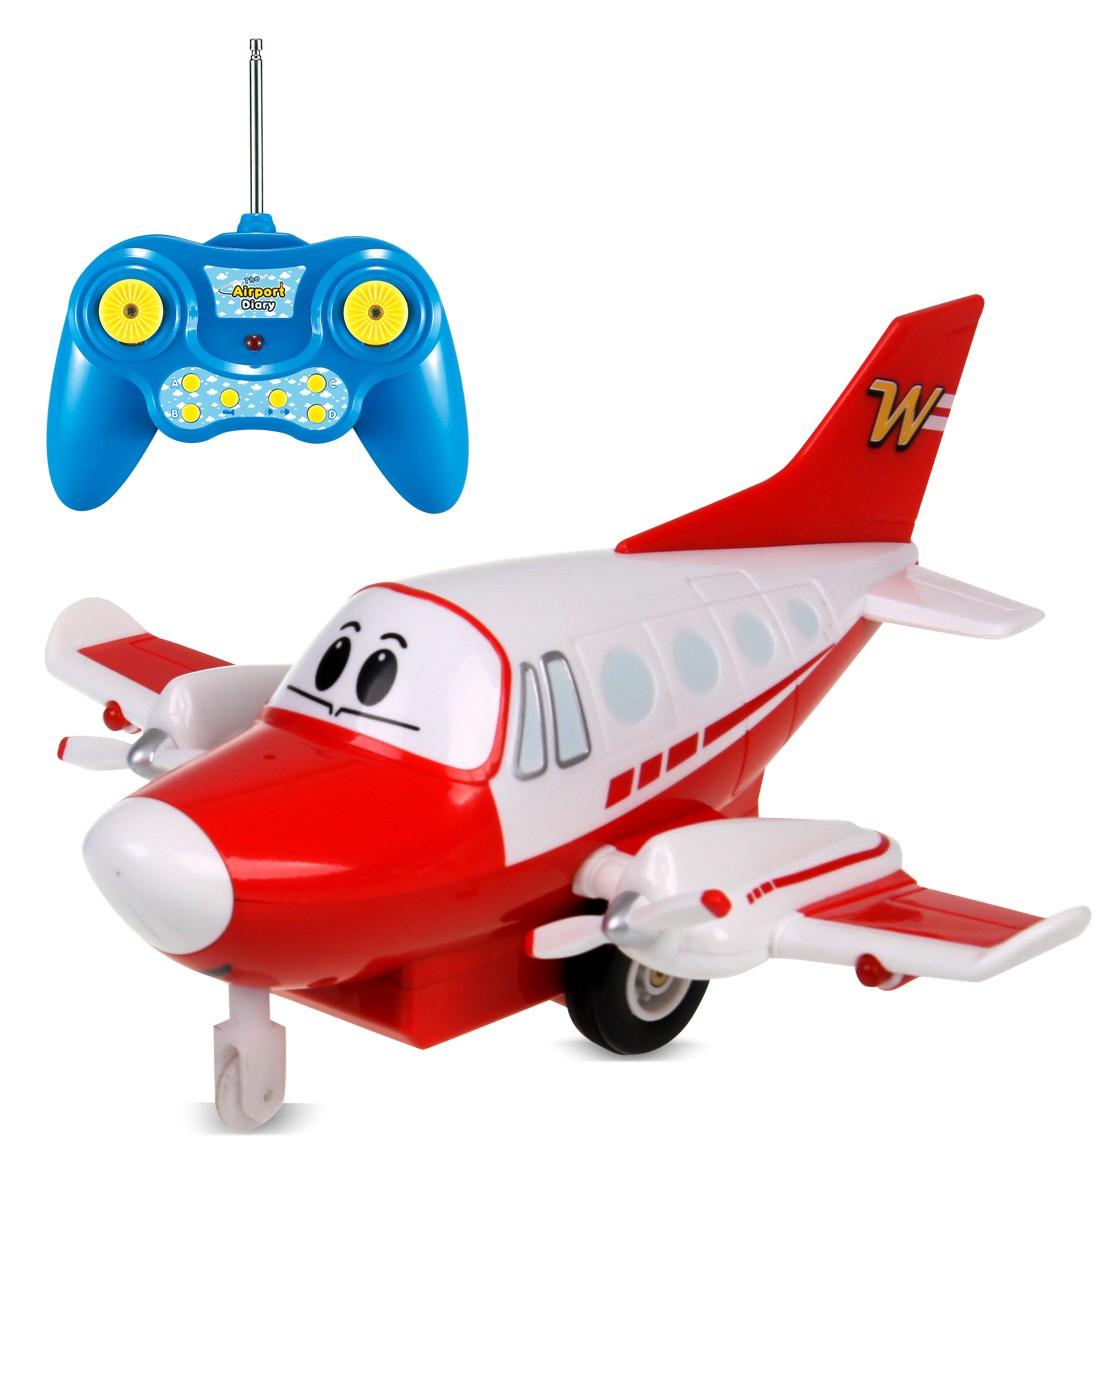 qi玩具专场云奇遥控飞机116-w